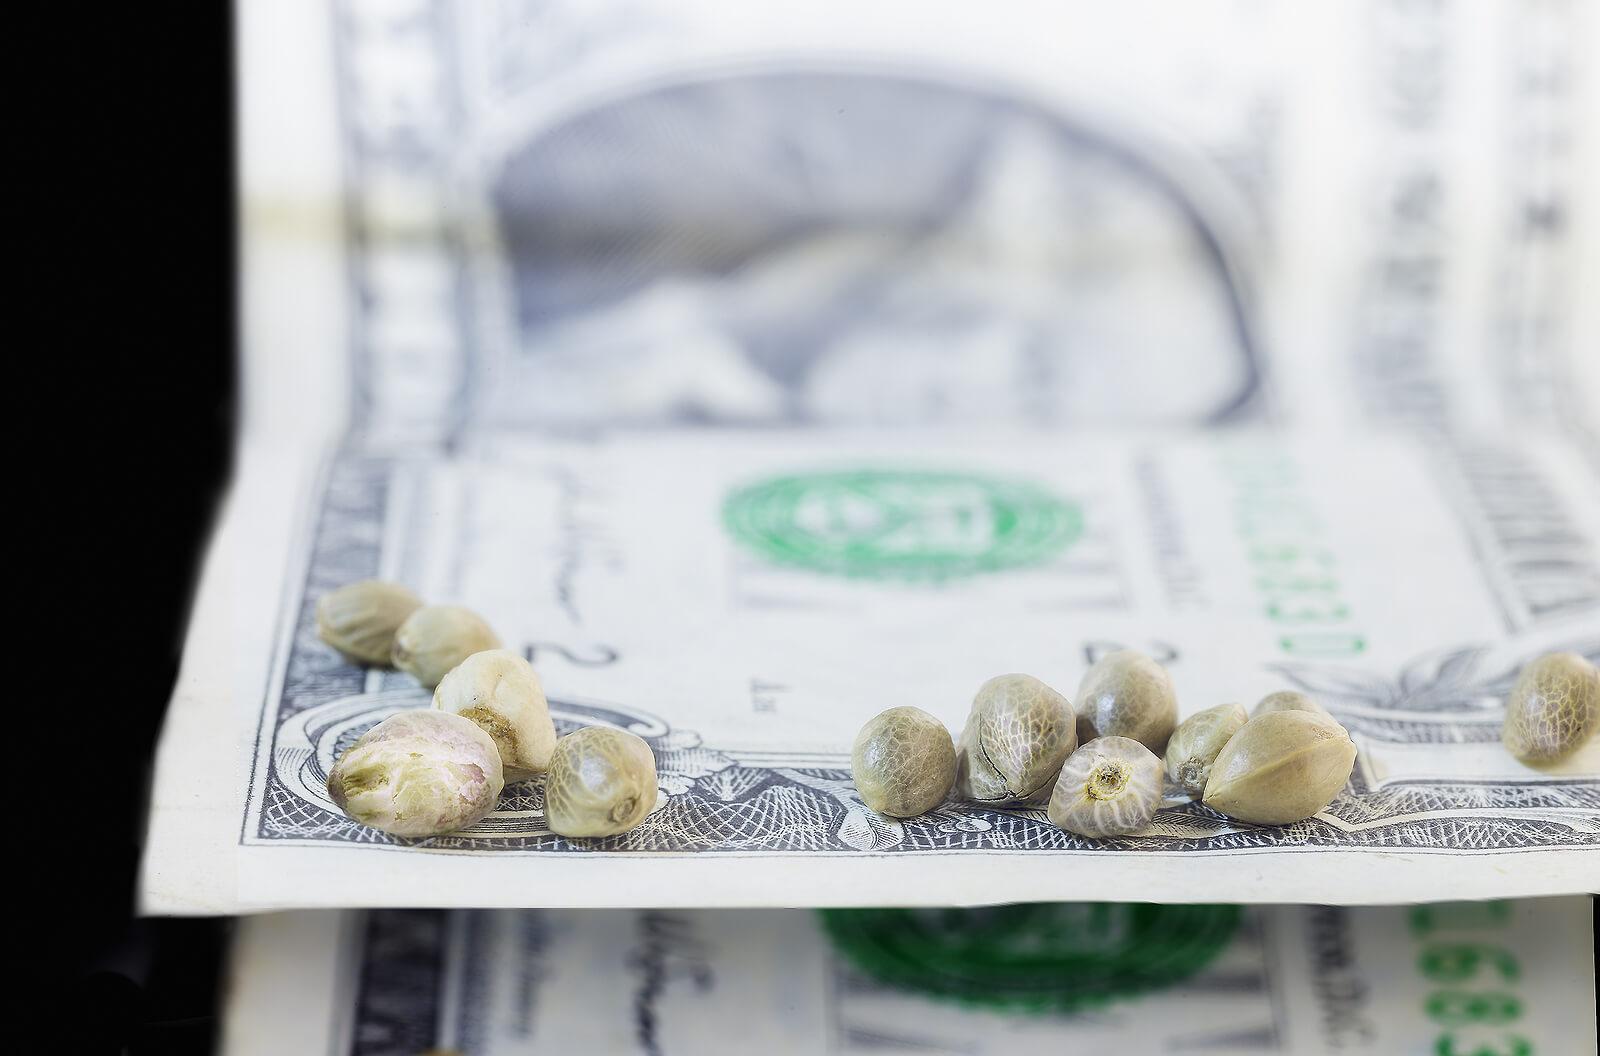 Buy Marijuana Seeds In Carlsbad